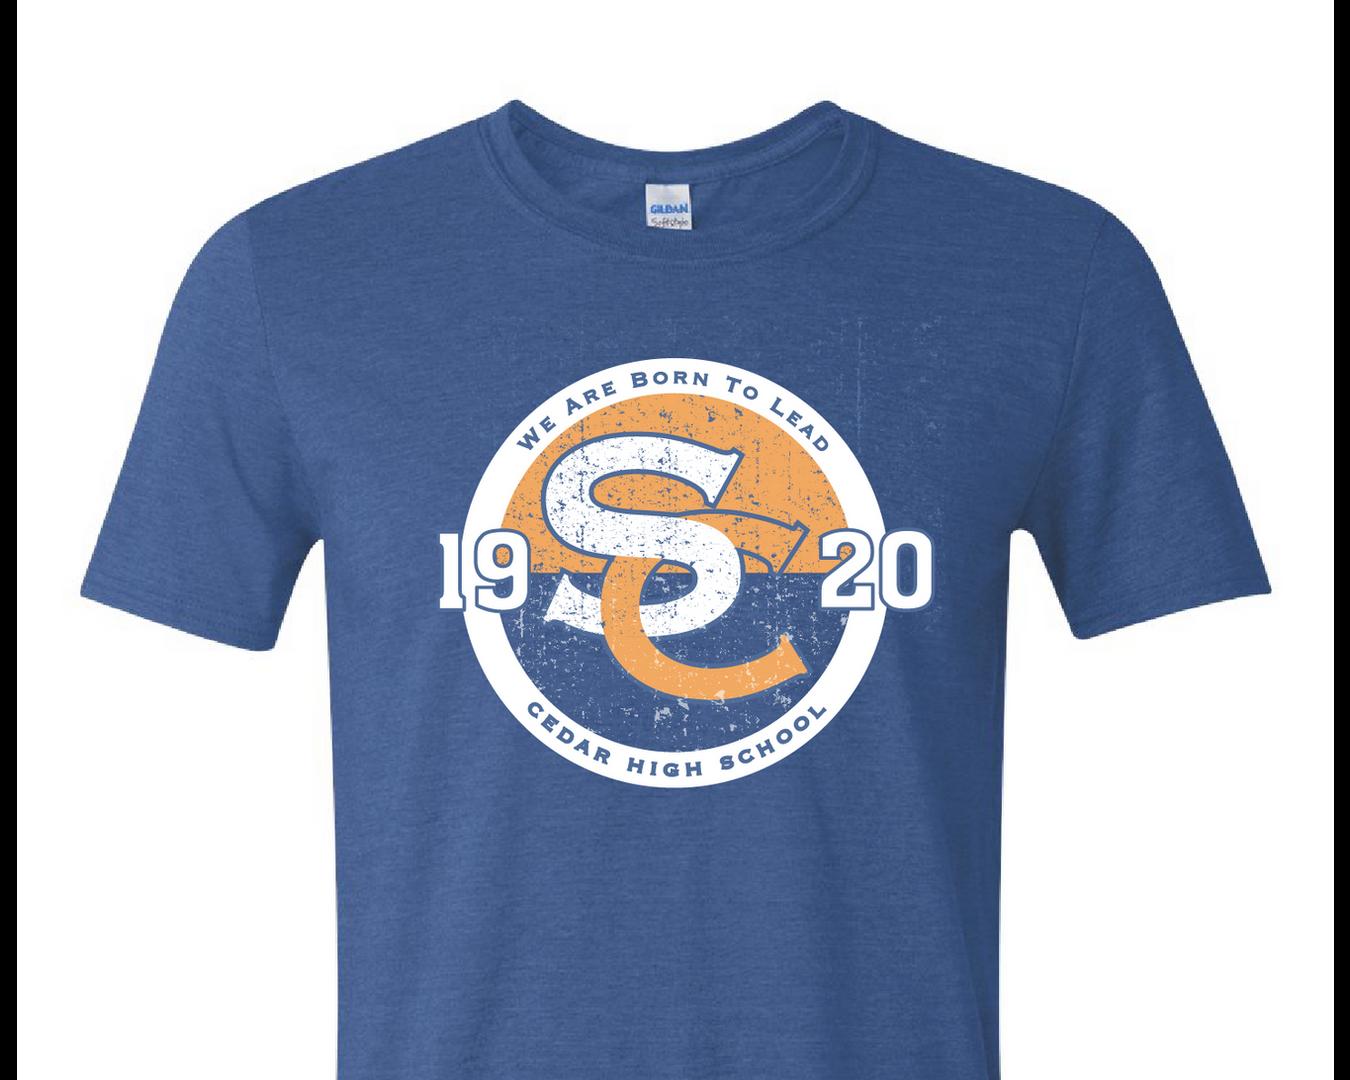 11123B Student Concil Designs - Shirt